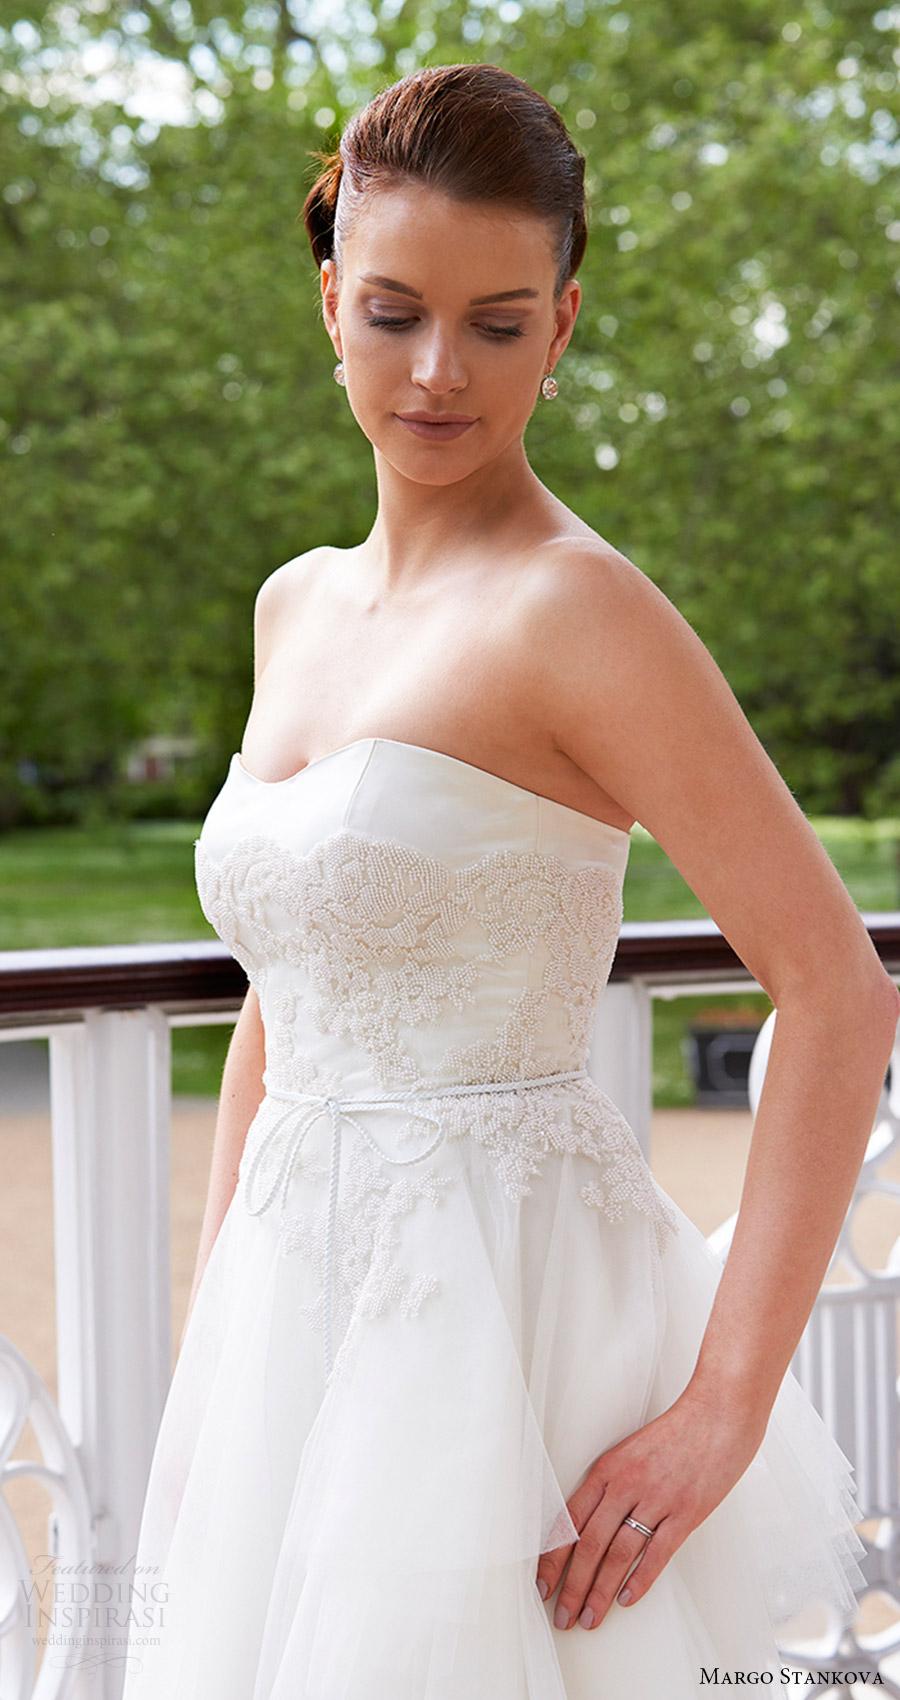 margo stankova bridal 2017 strapless sweetheart ball gown wedding dress (05) zv beaded bodice